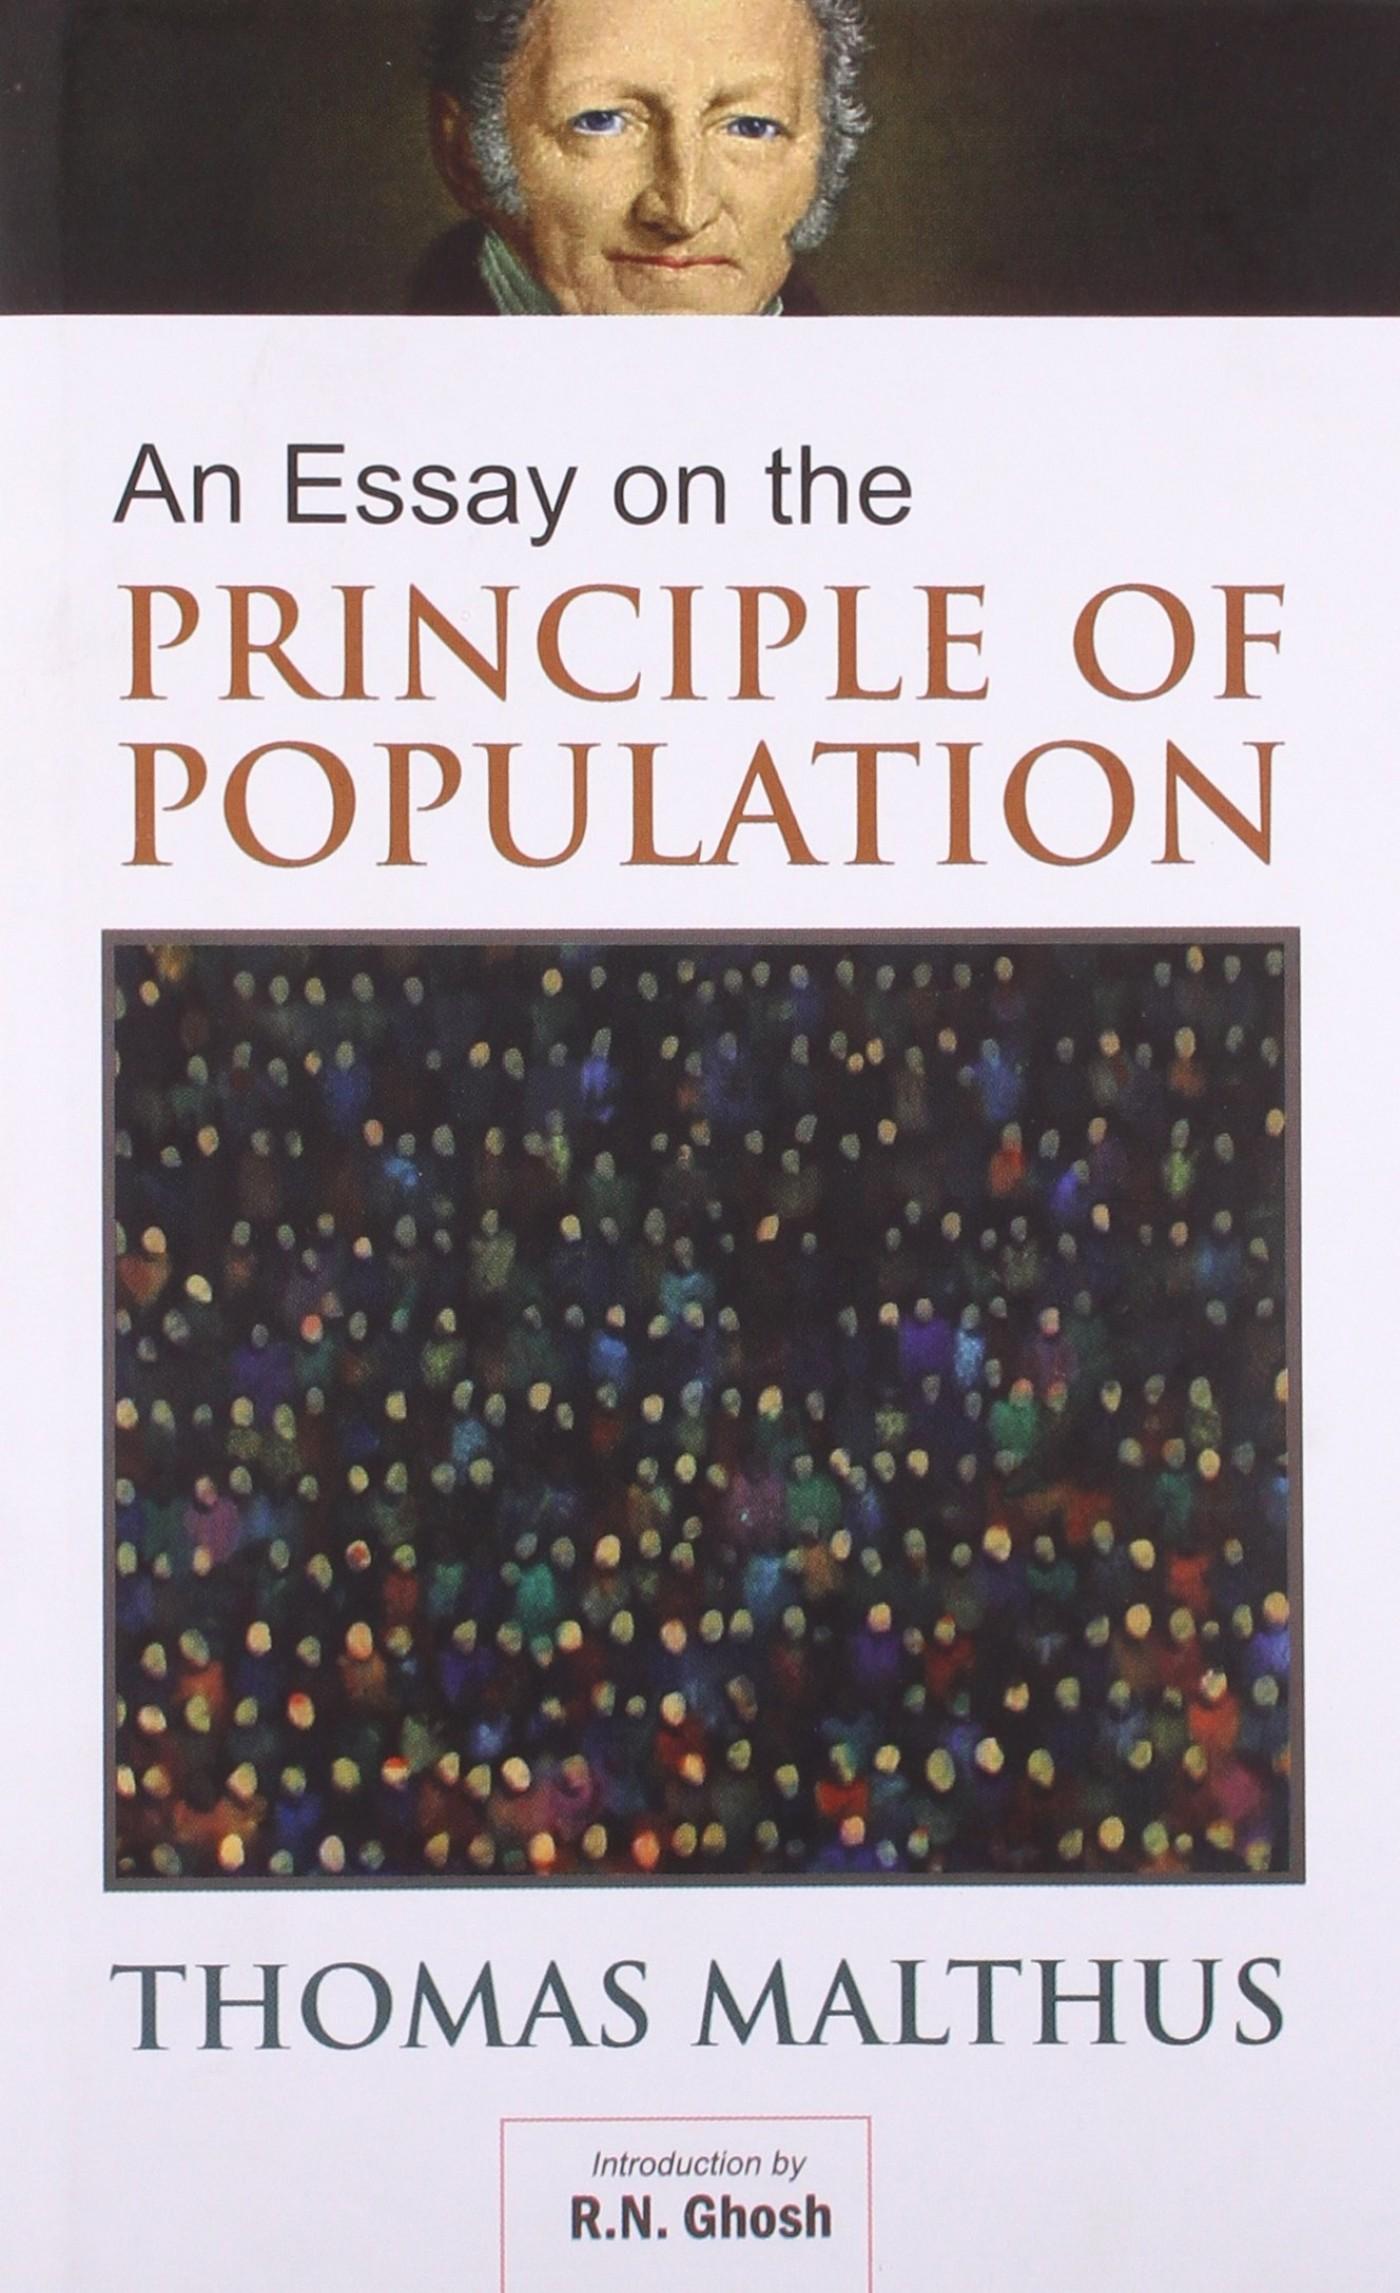 006 Essay On The Principle Of Population 8162bfm1ycfl Singular Malthus Sparknotes Thomas Main Idea 1400